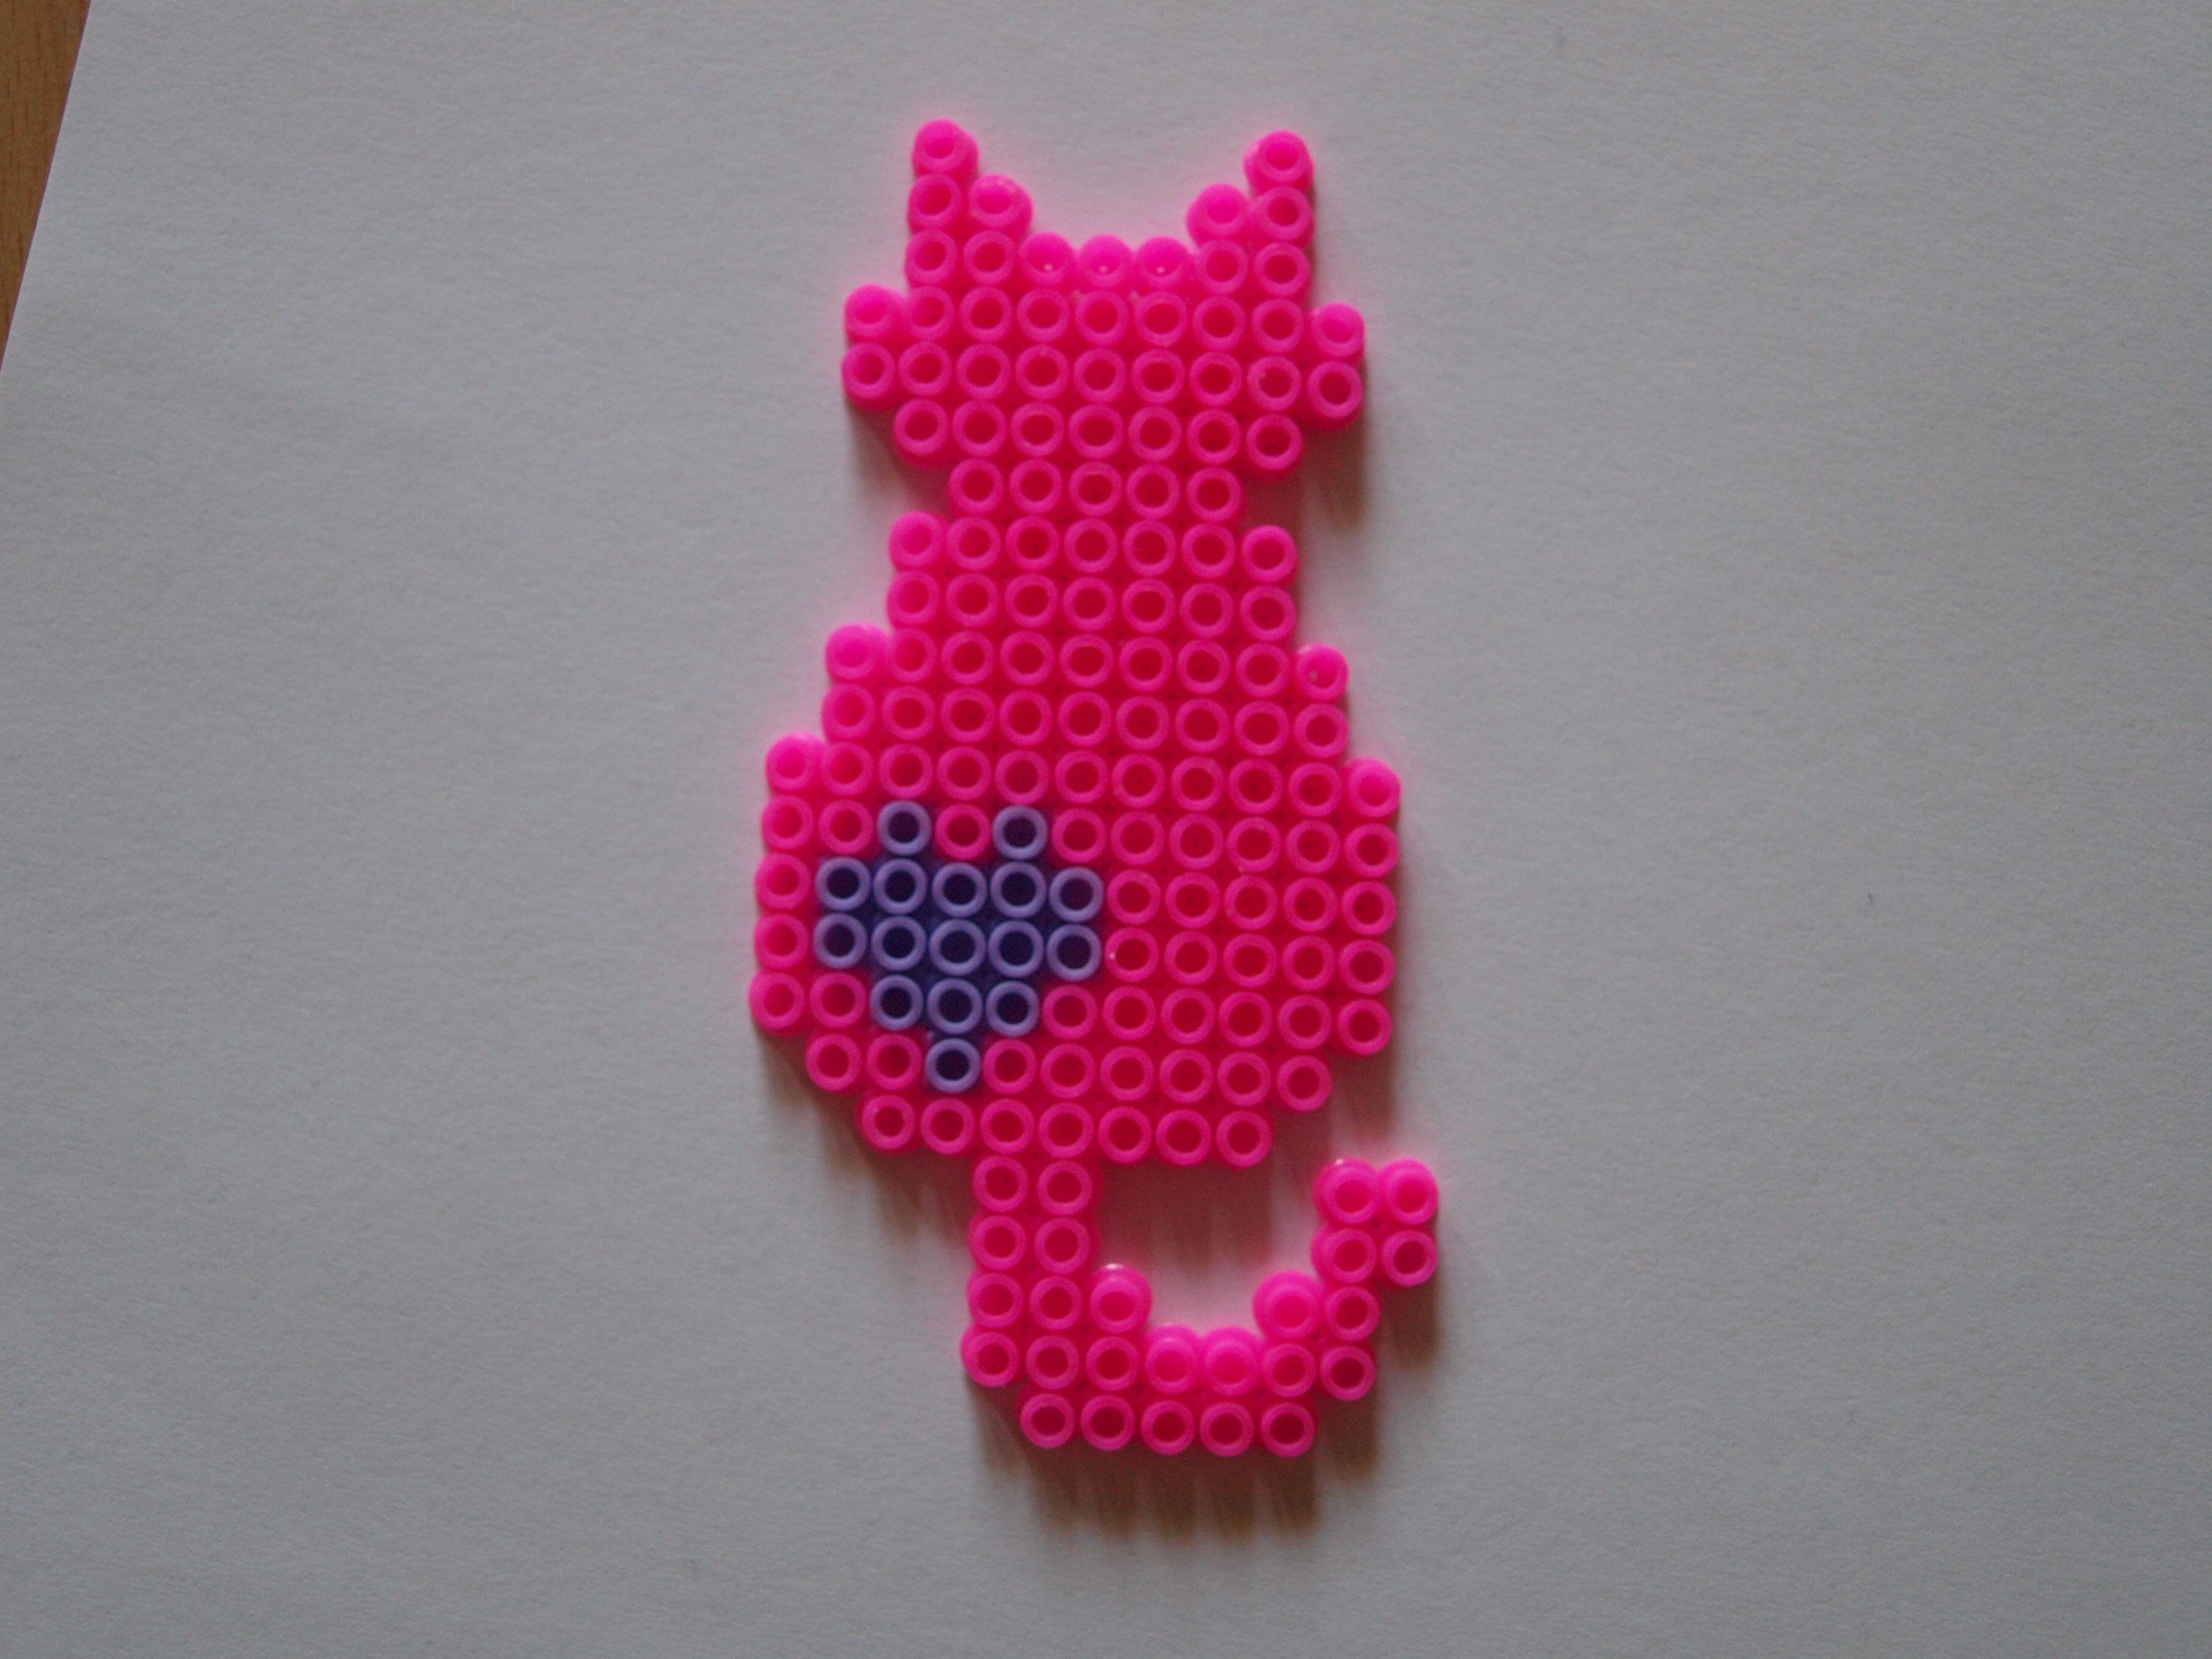 Bugelperlen Vorlage Katze Perler Beads Designs Perler Bead Art Hama Beads Design